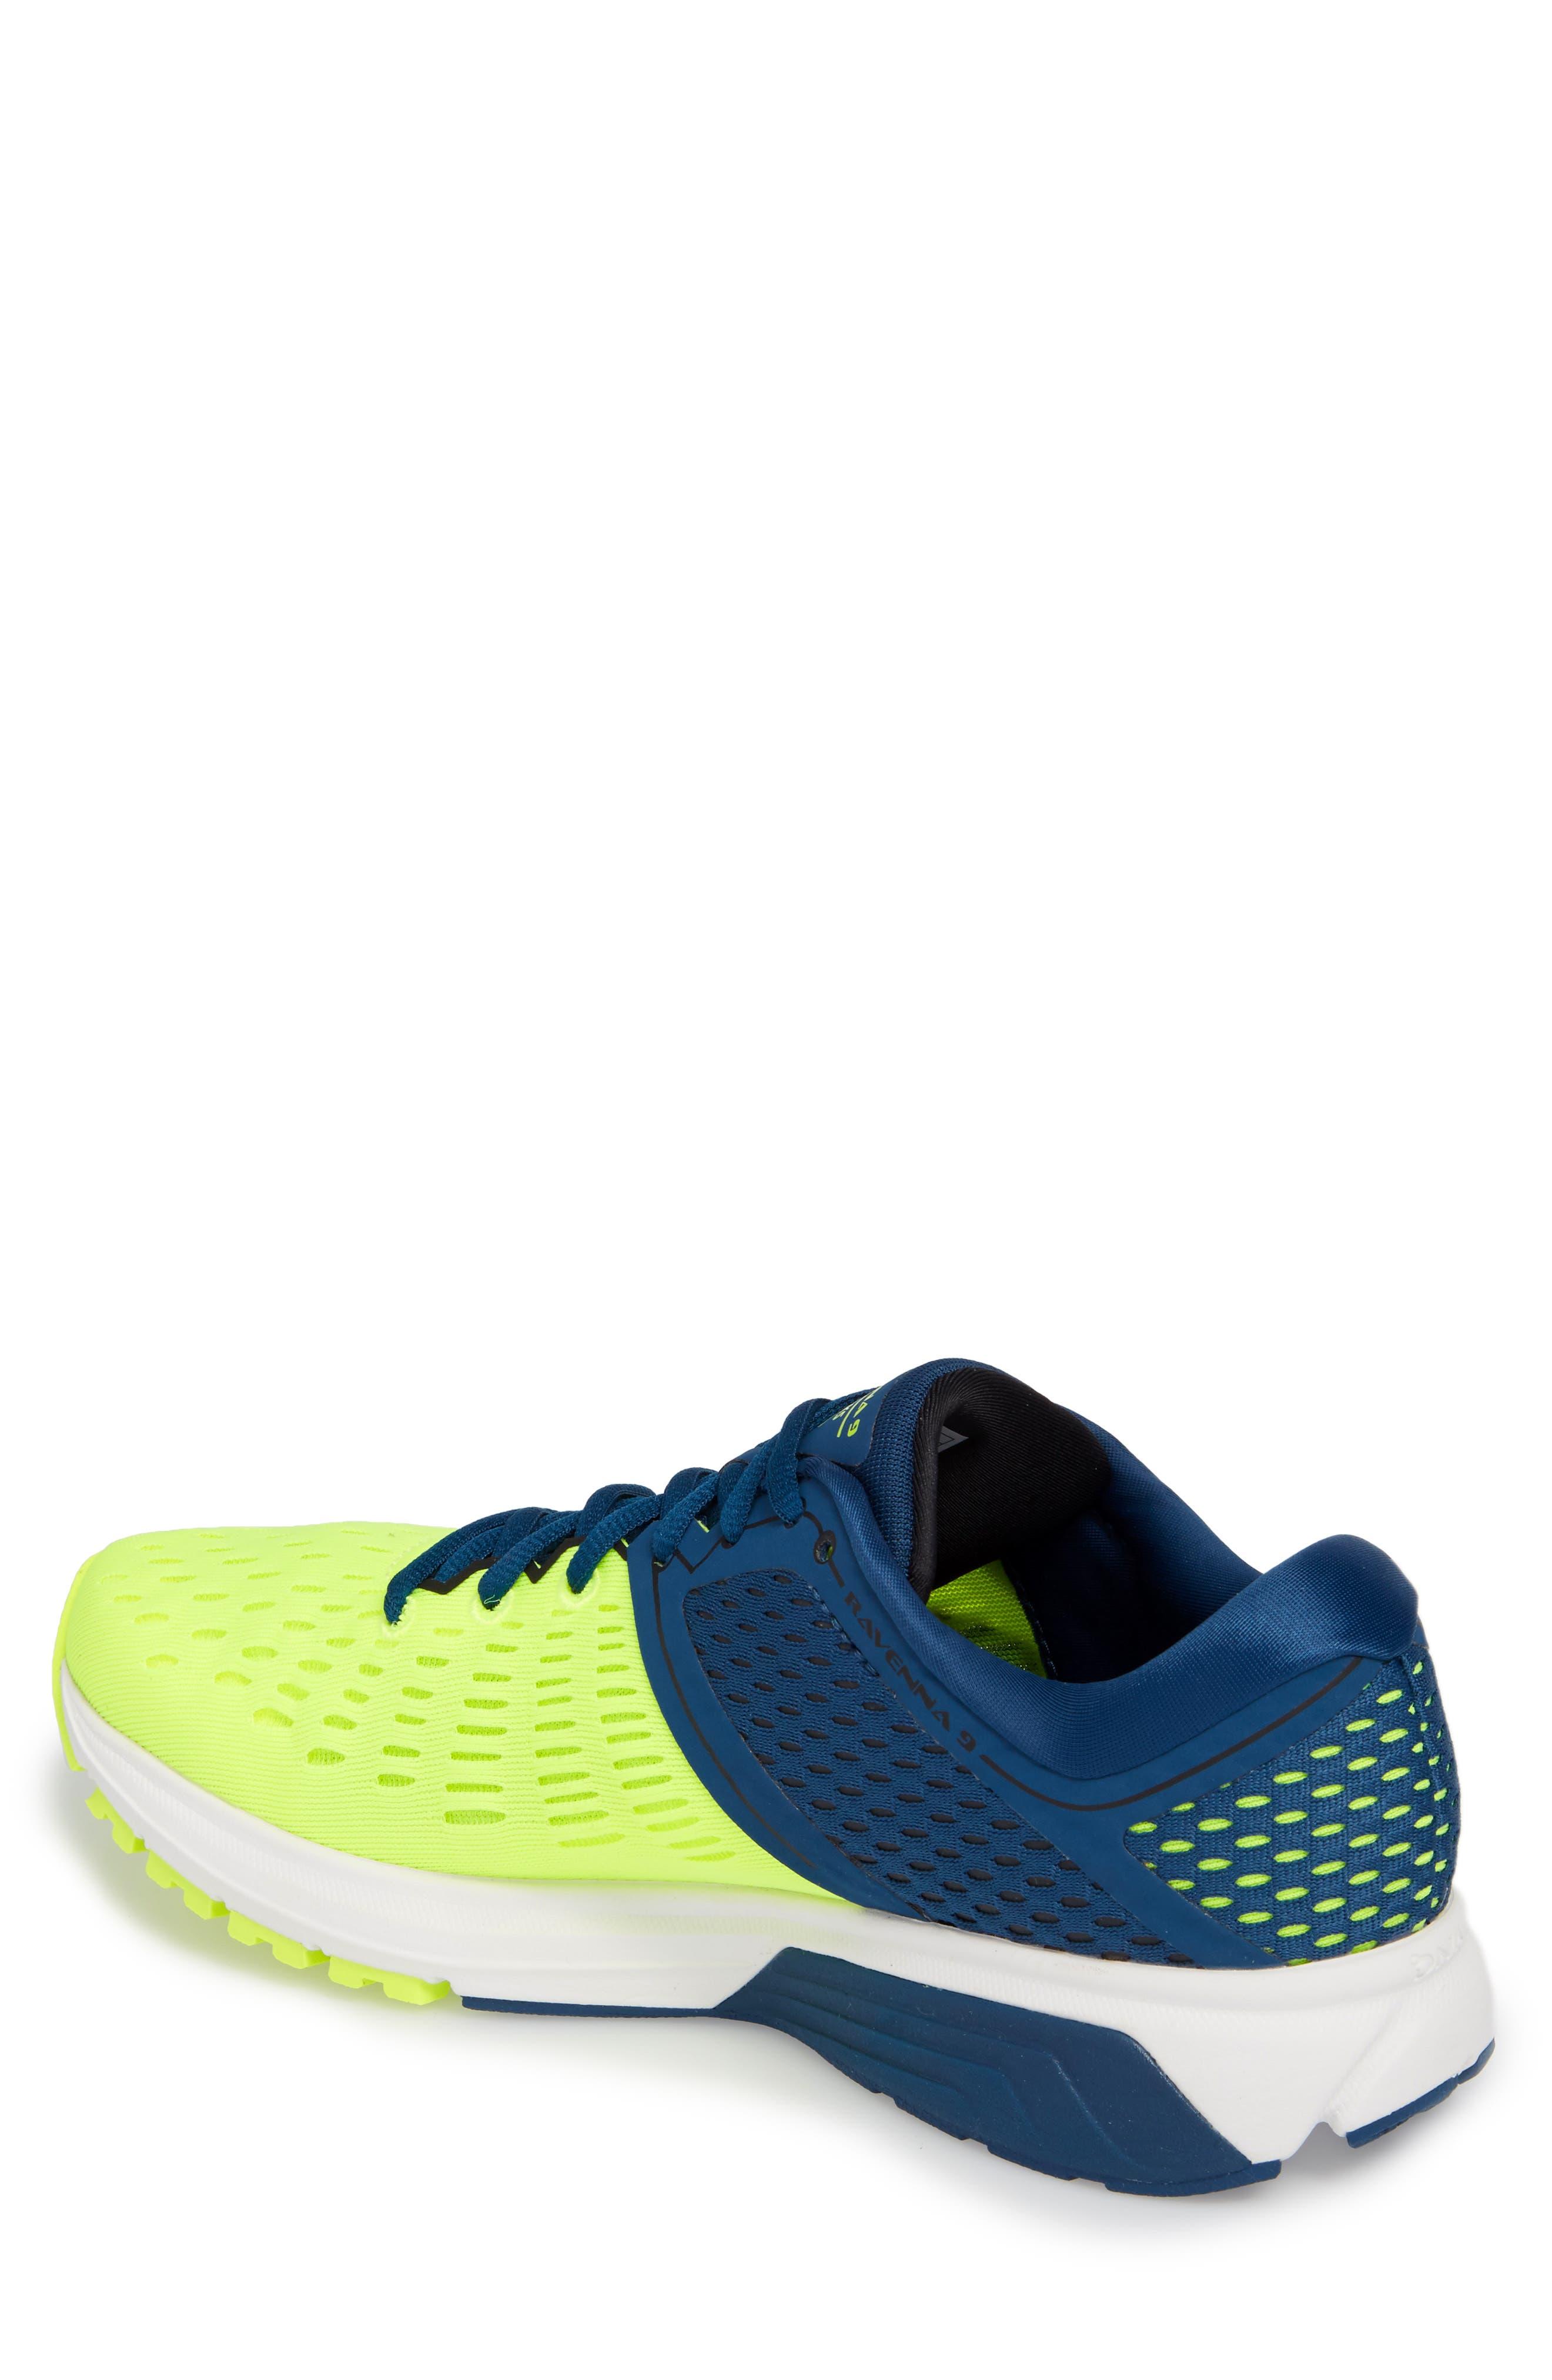 Ravenna 9 Running Shoe,                             Alternate thumbnail 2, color,                             Nightlife/ Blue/ Black